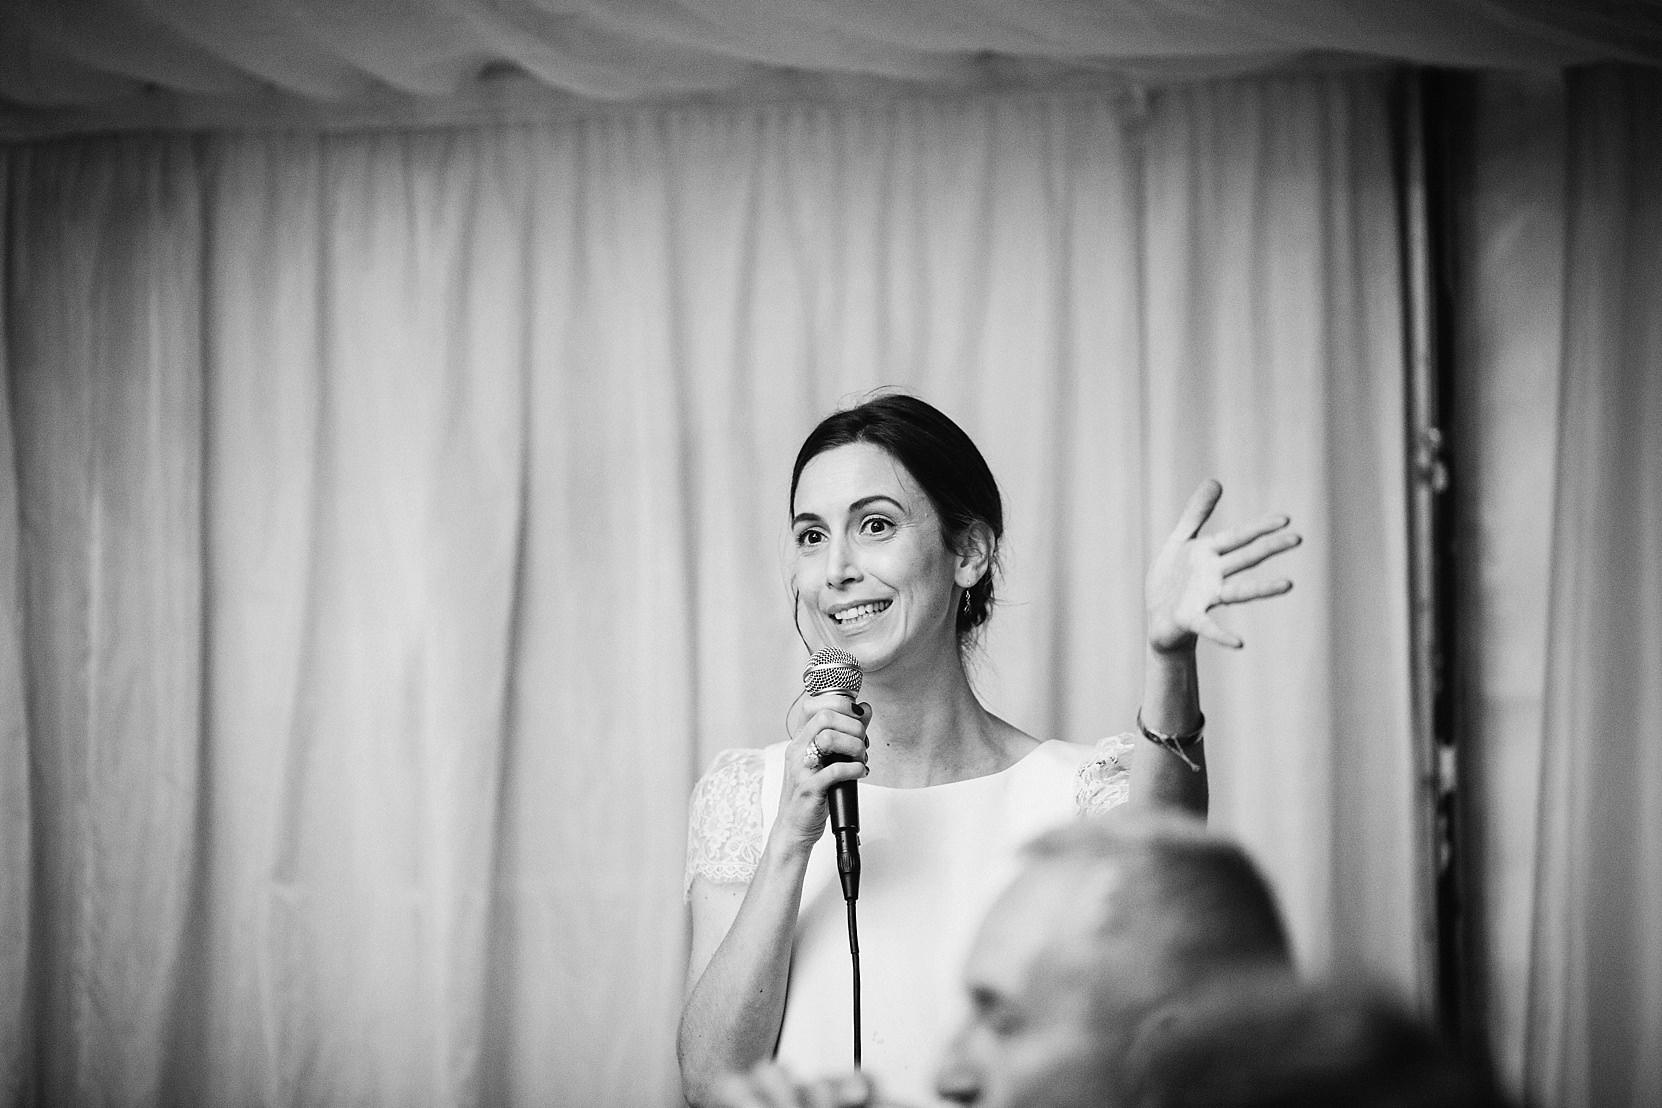 Bride making a speech at her wedding